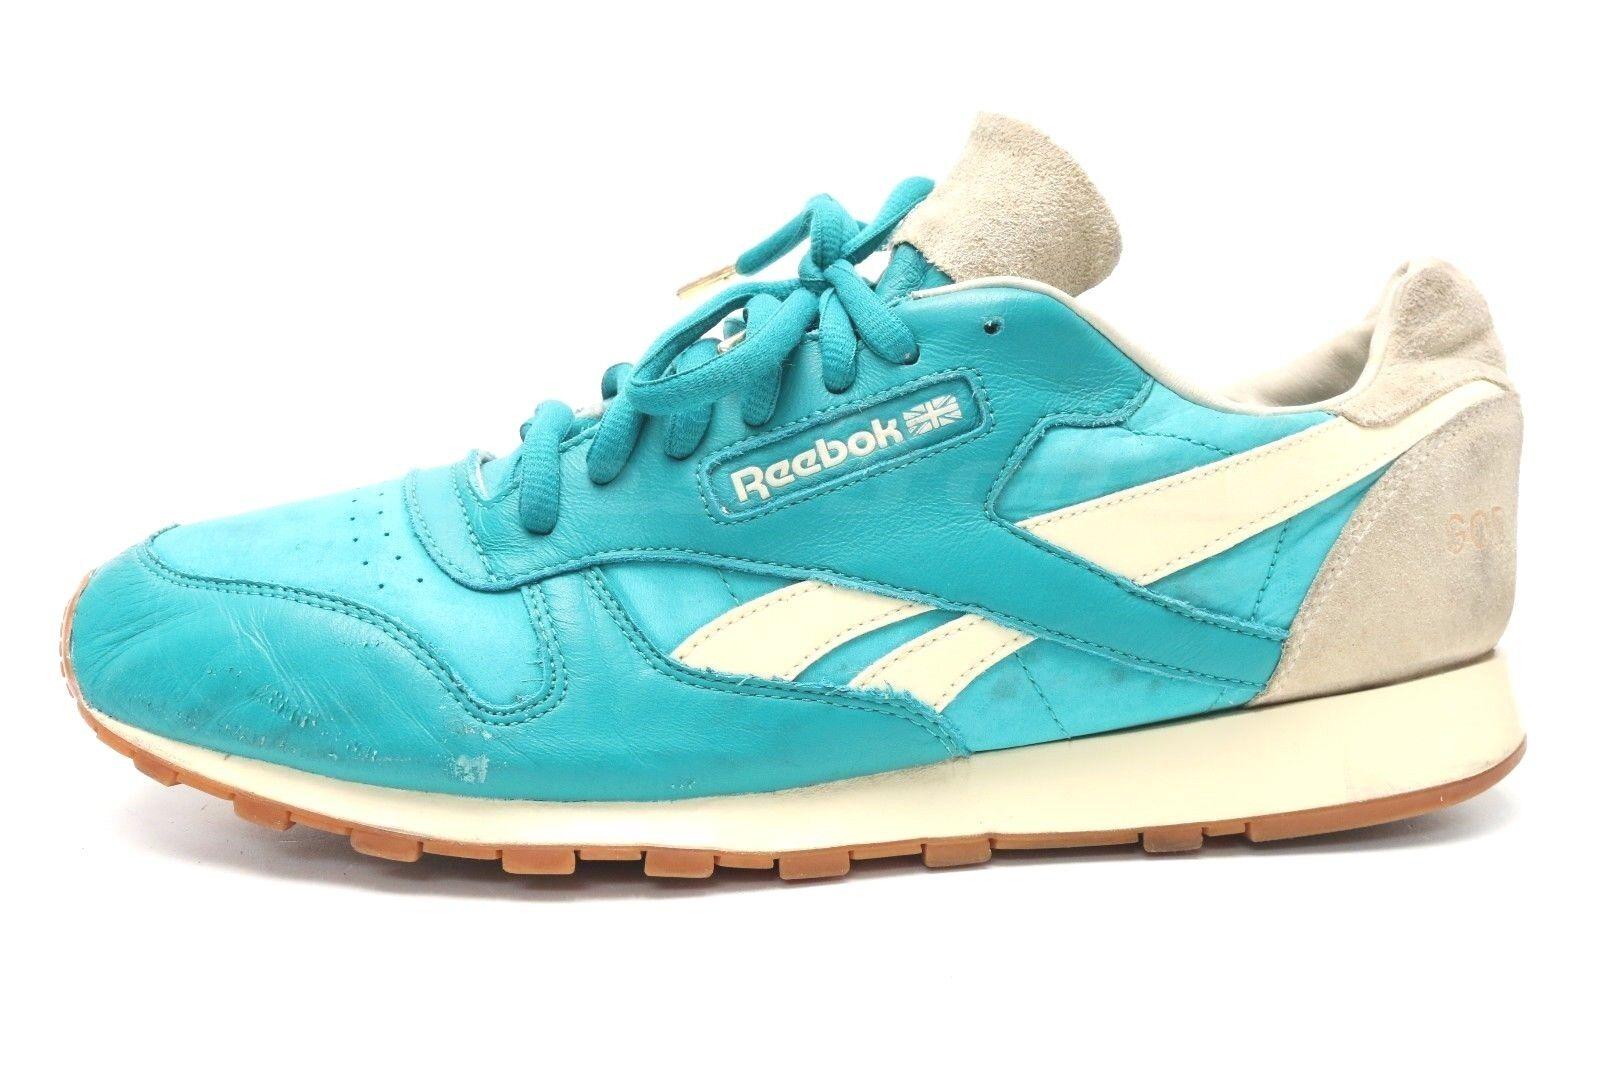 REEBOK SPIRIT of DETROIT Turquoise Leather Running Sneakers sz. 12 US 45.5 EU